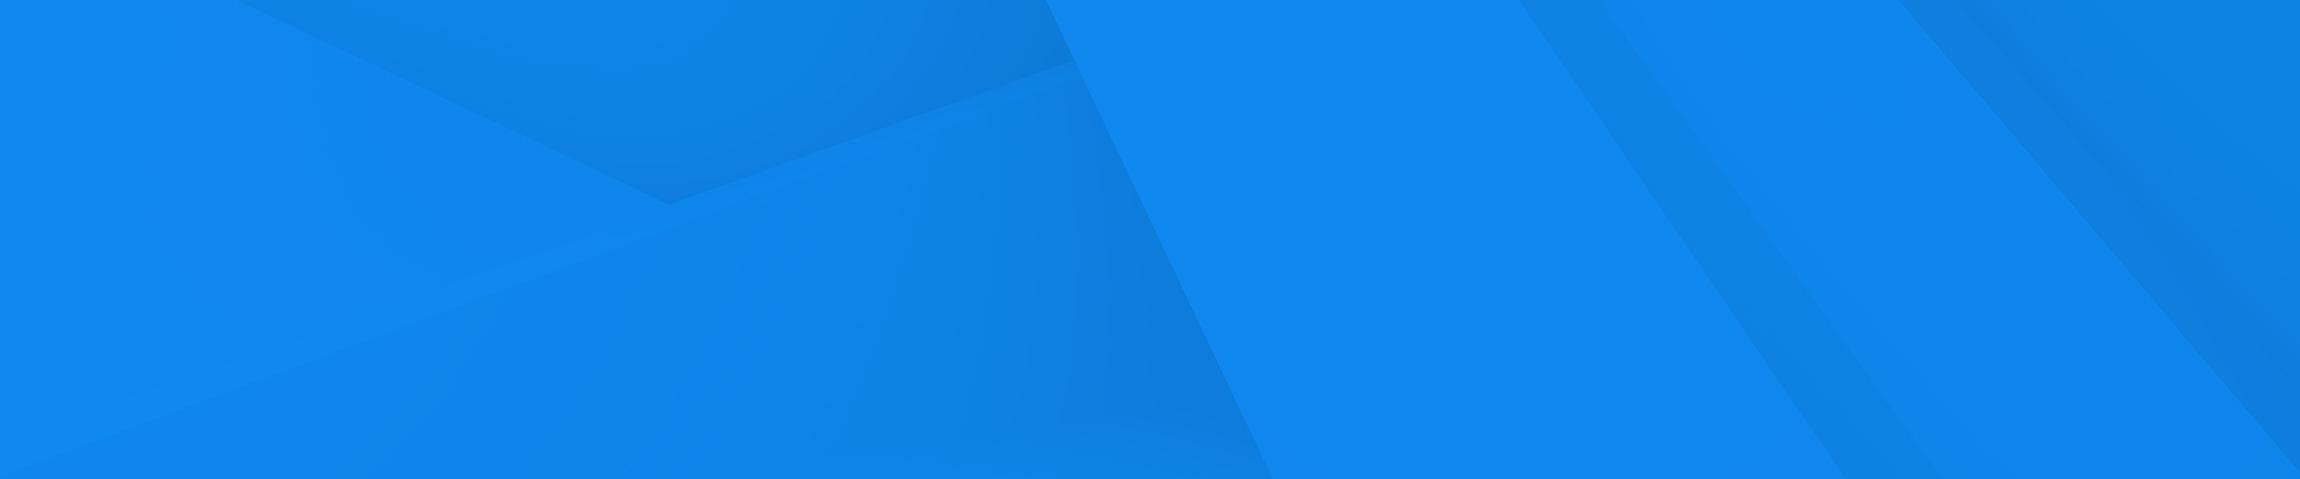 geometic-bg-blue